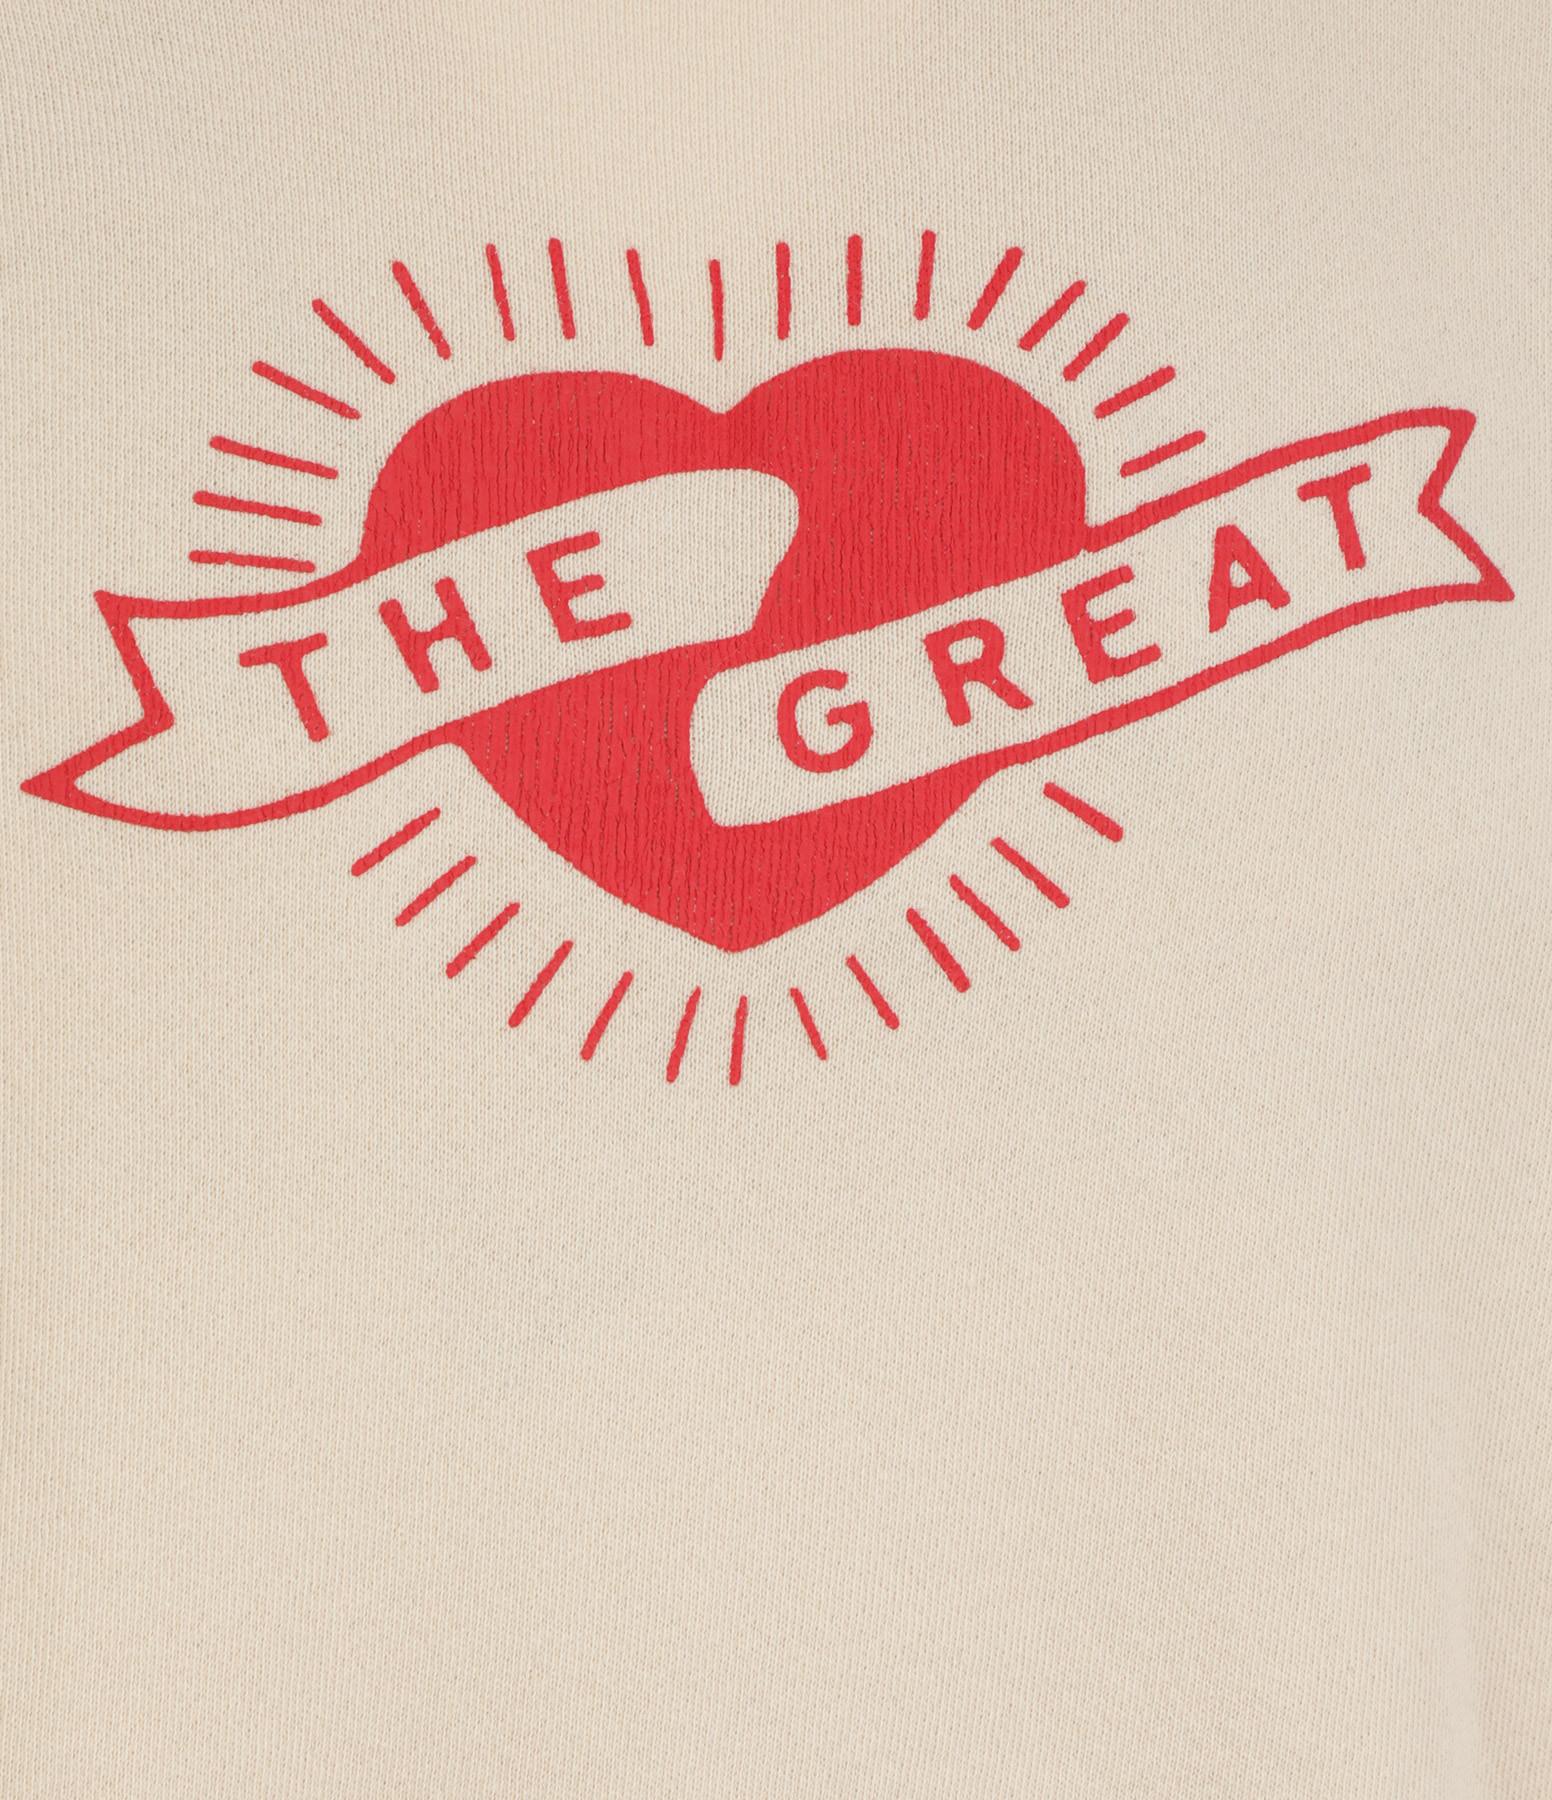 THE GREAT - Sweatshirt The Shrunken Coton Rose